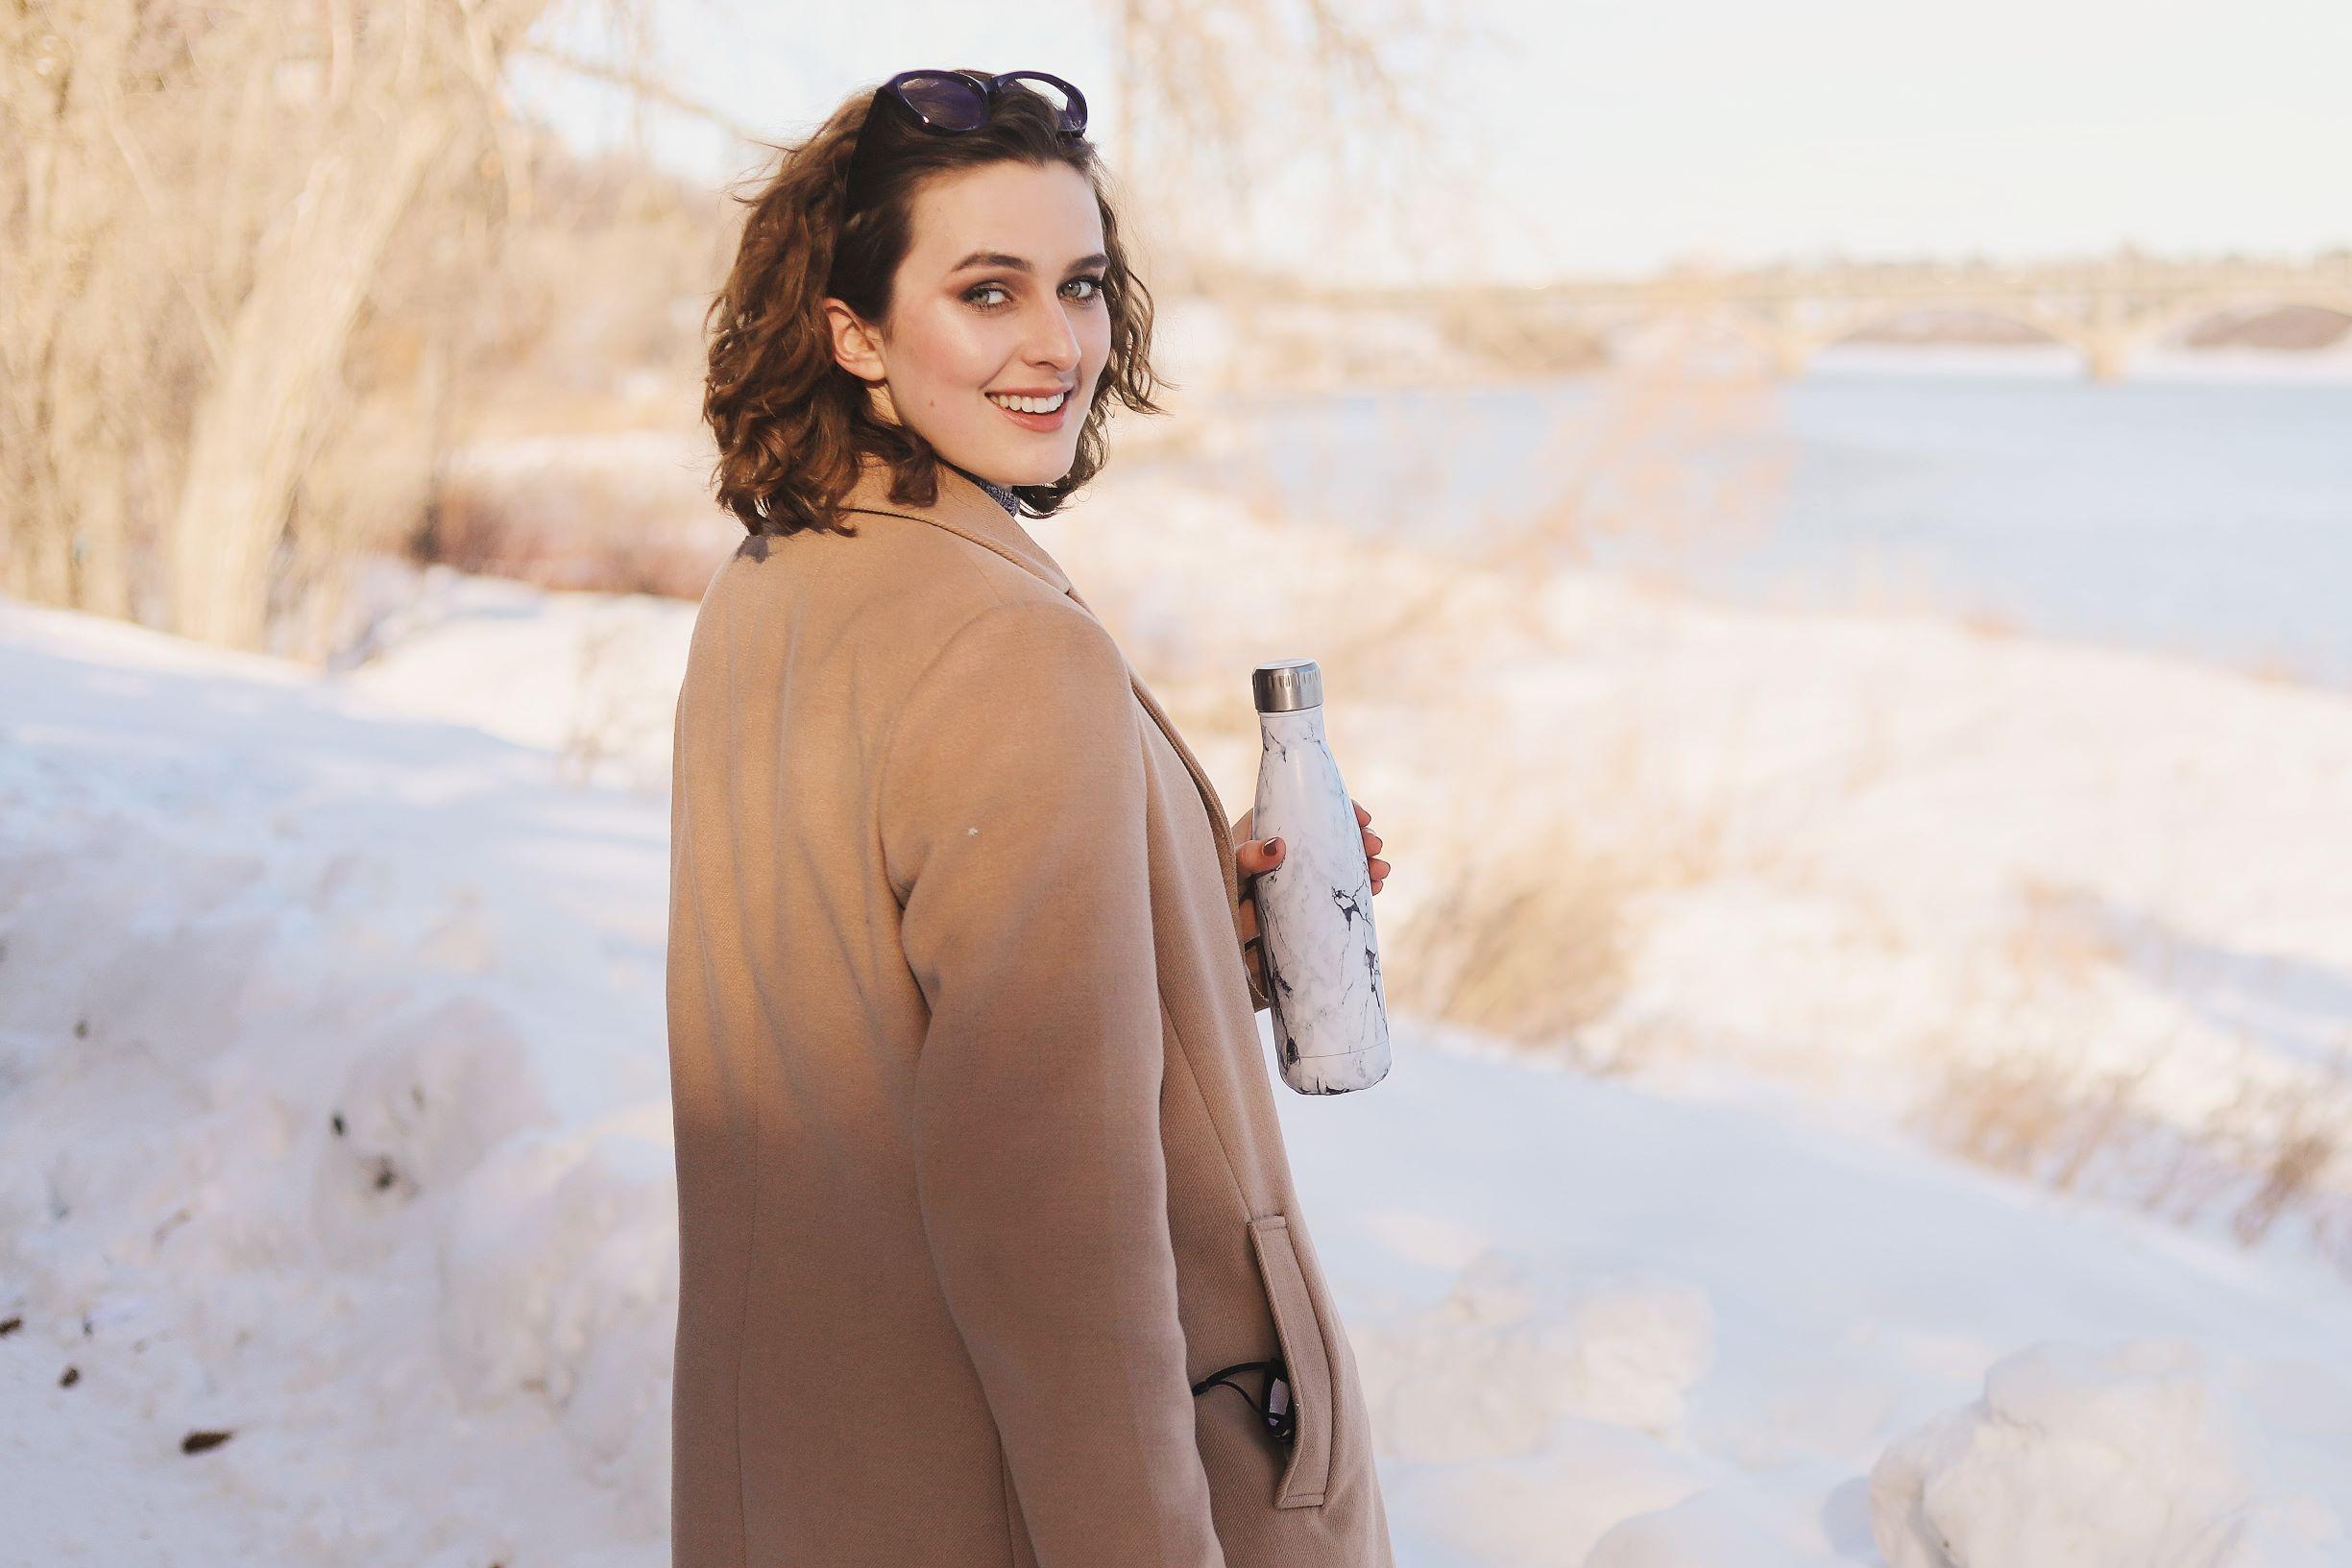 LeClair Organics Coffee Saskatoon, Coffee Roaster Saskatoon commercial photography with Jenna Rozlin 15